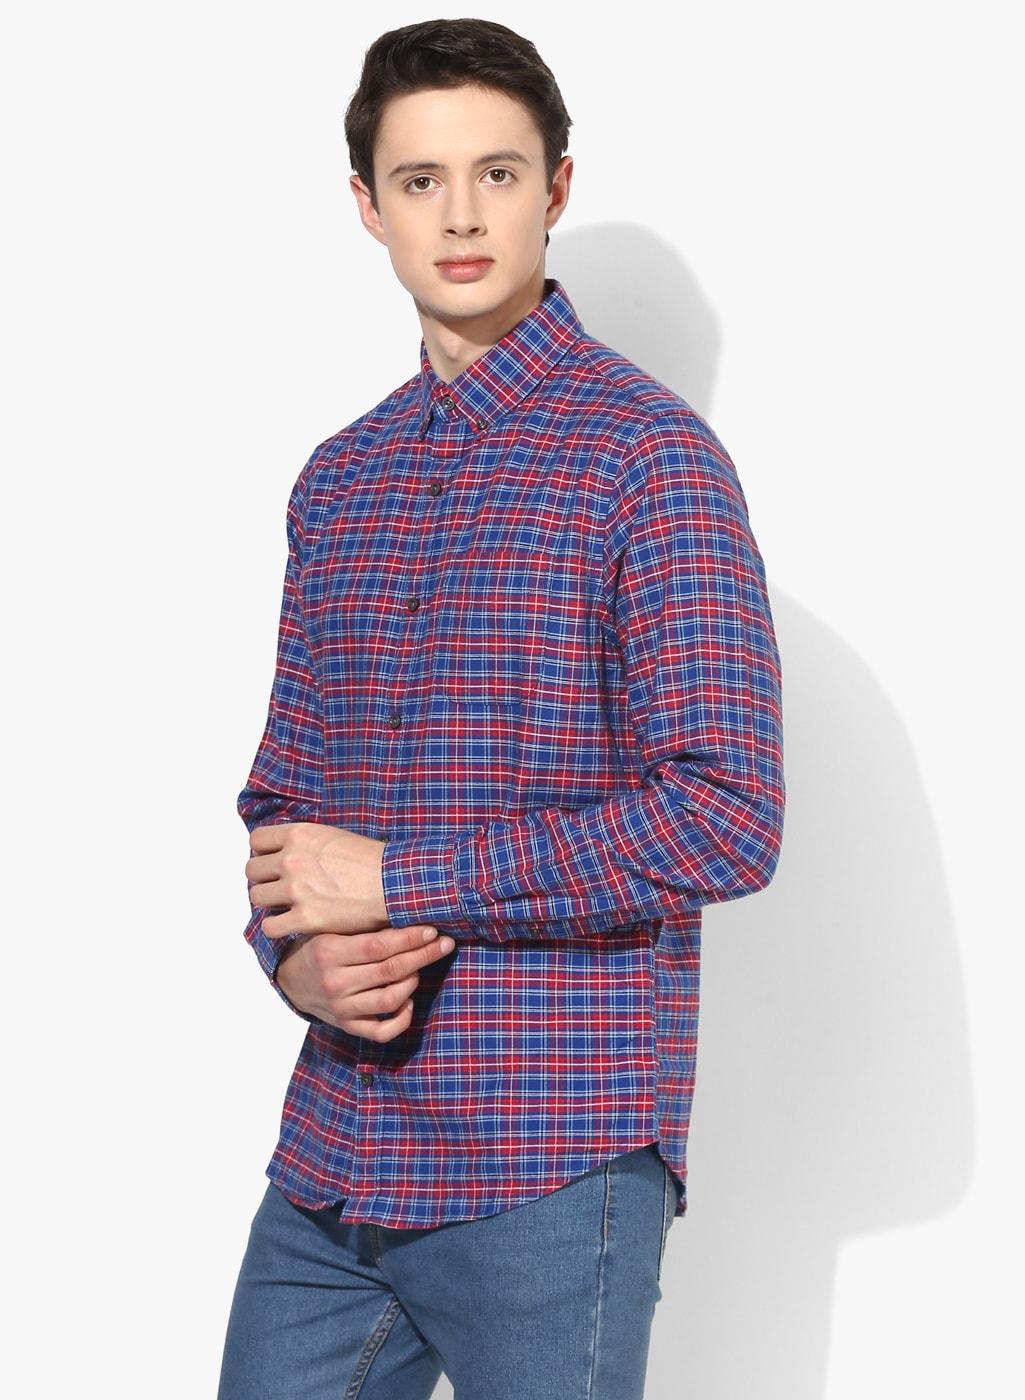 f7448c5a2a Gap Men Shirts - Buy Gap Men Shirts online in India - Jabong